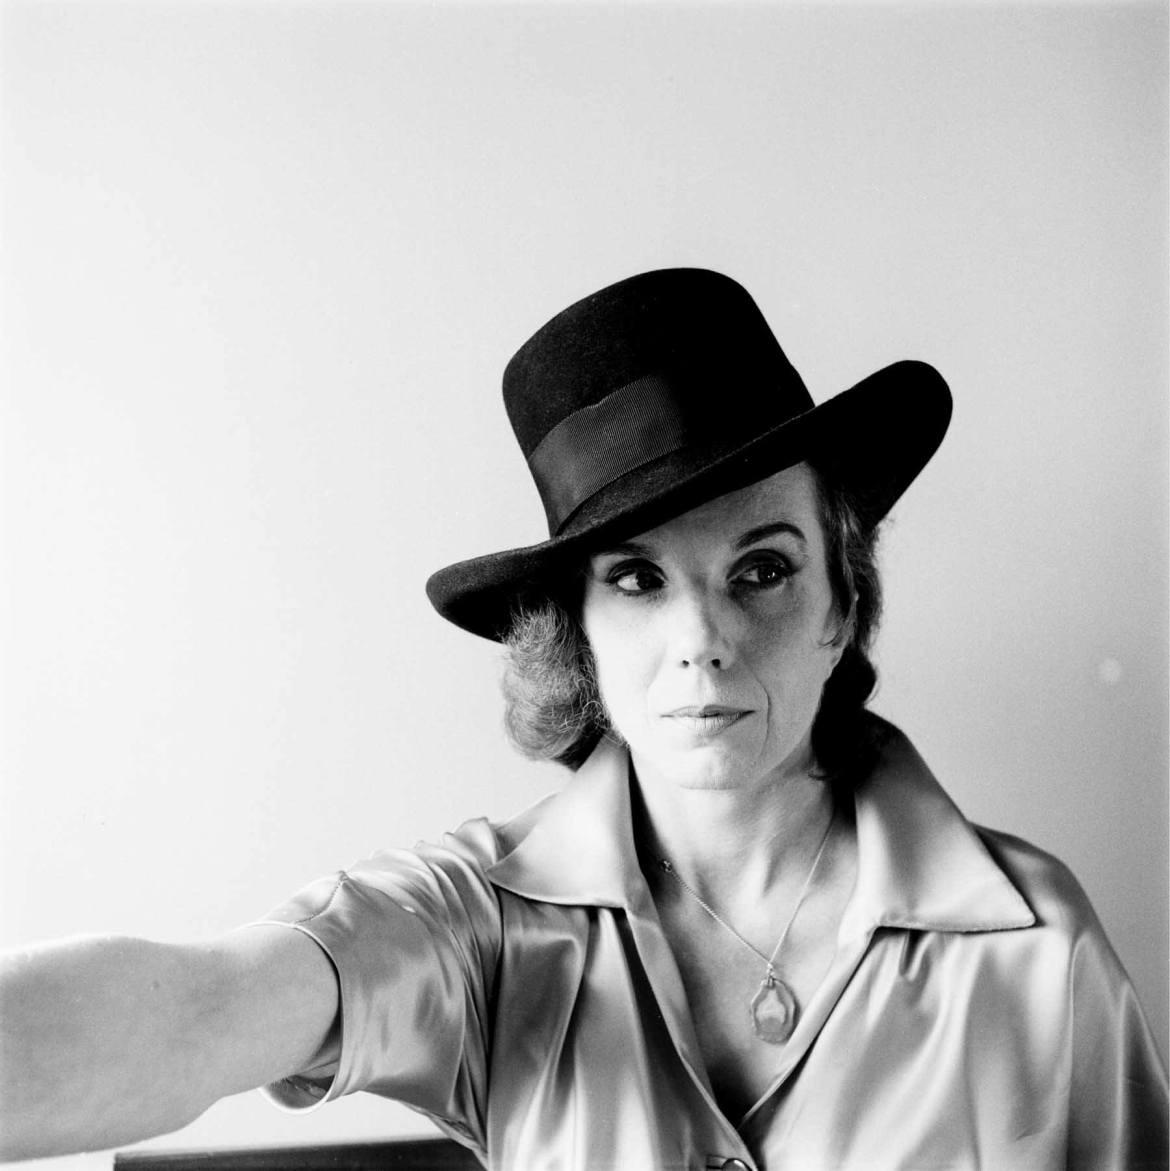 Maggie Diaz Self-portrait 1960s